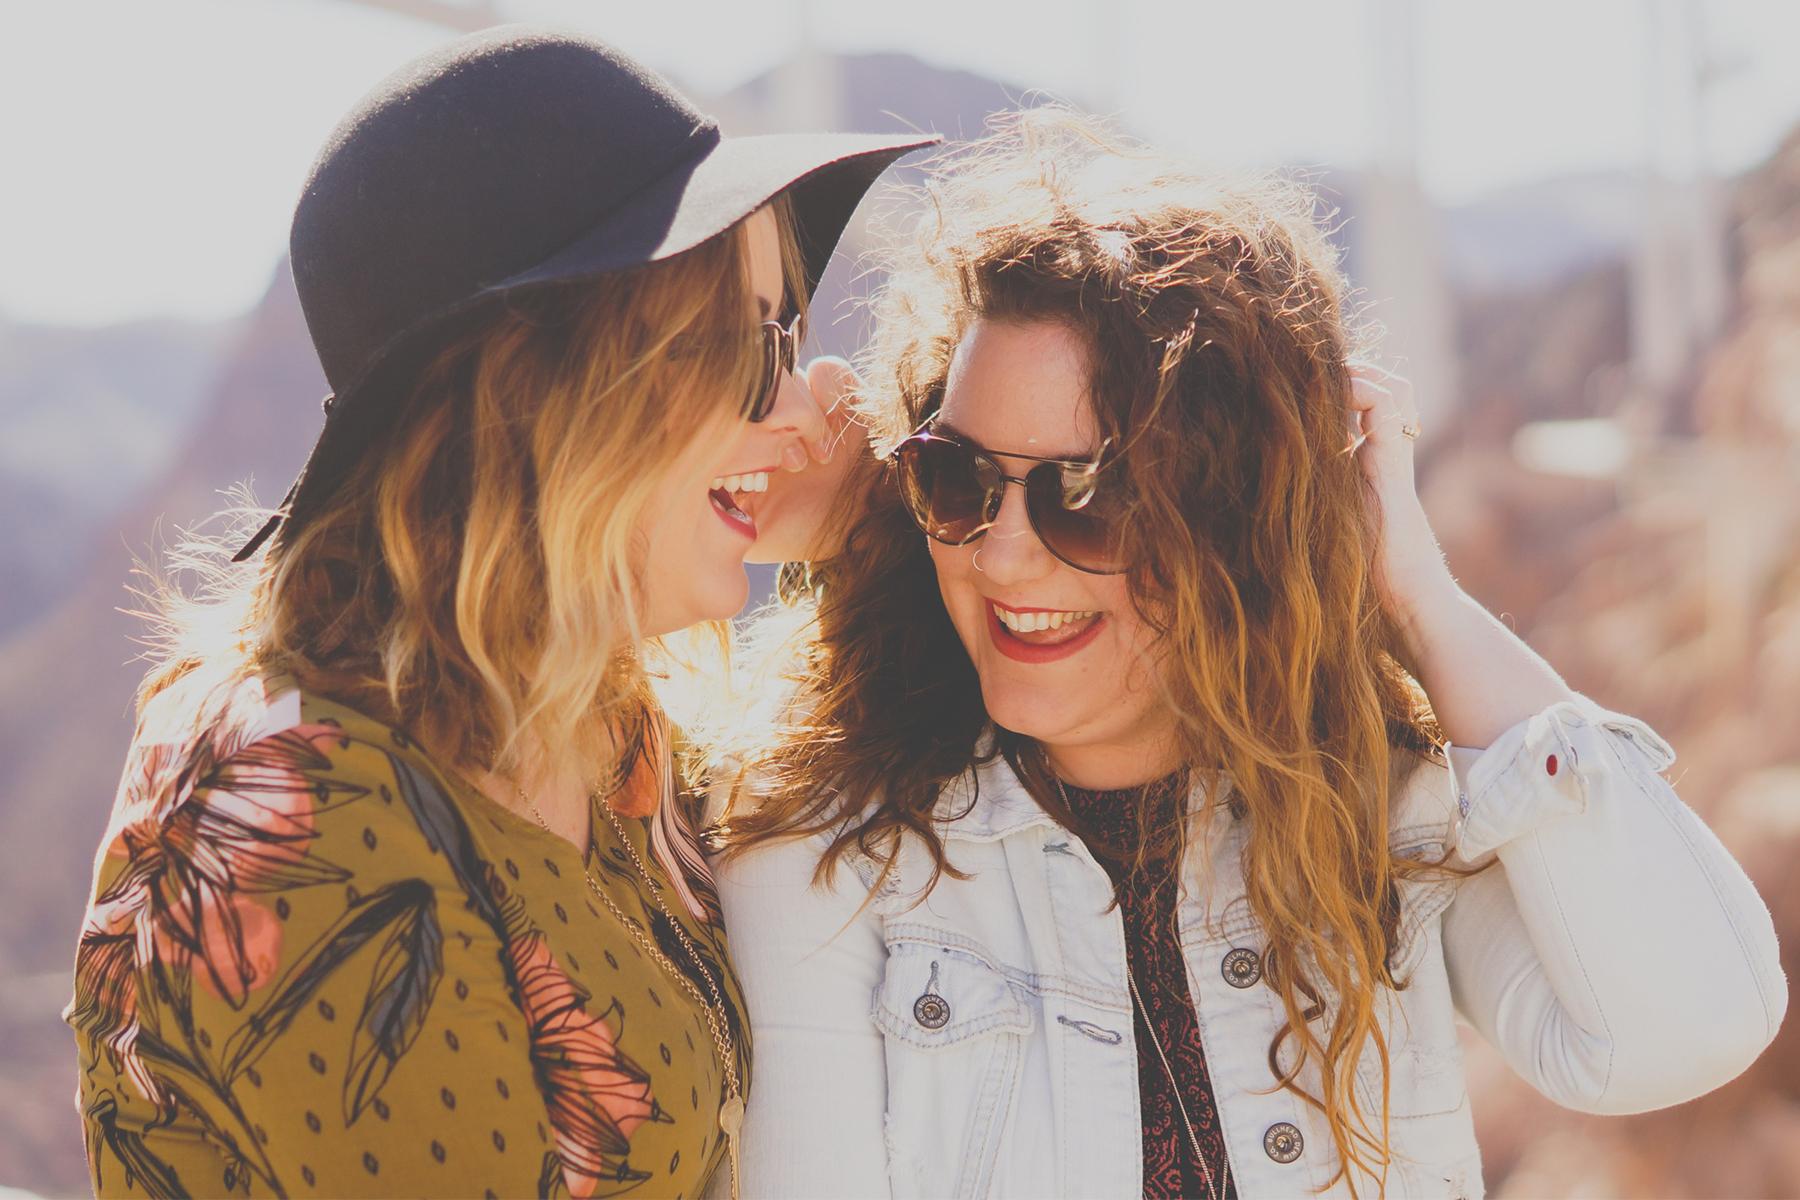 Marie und Joana